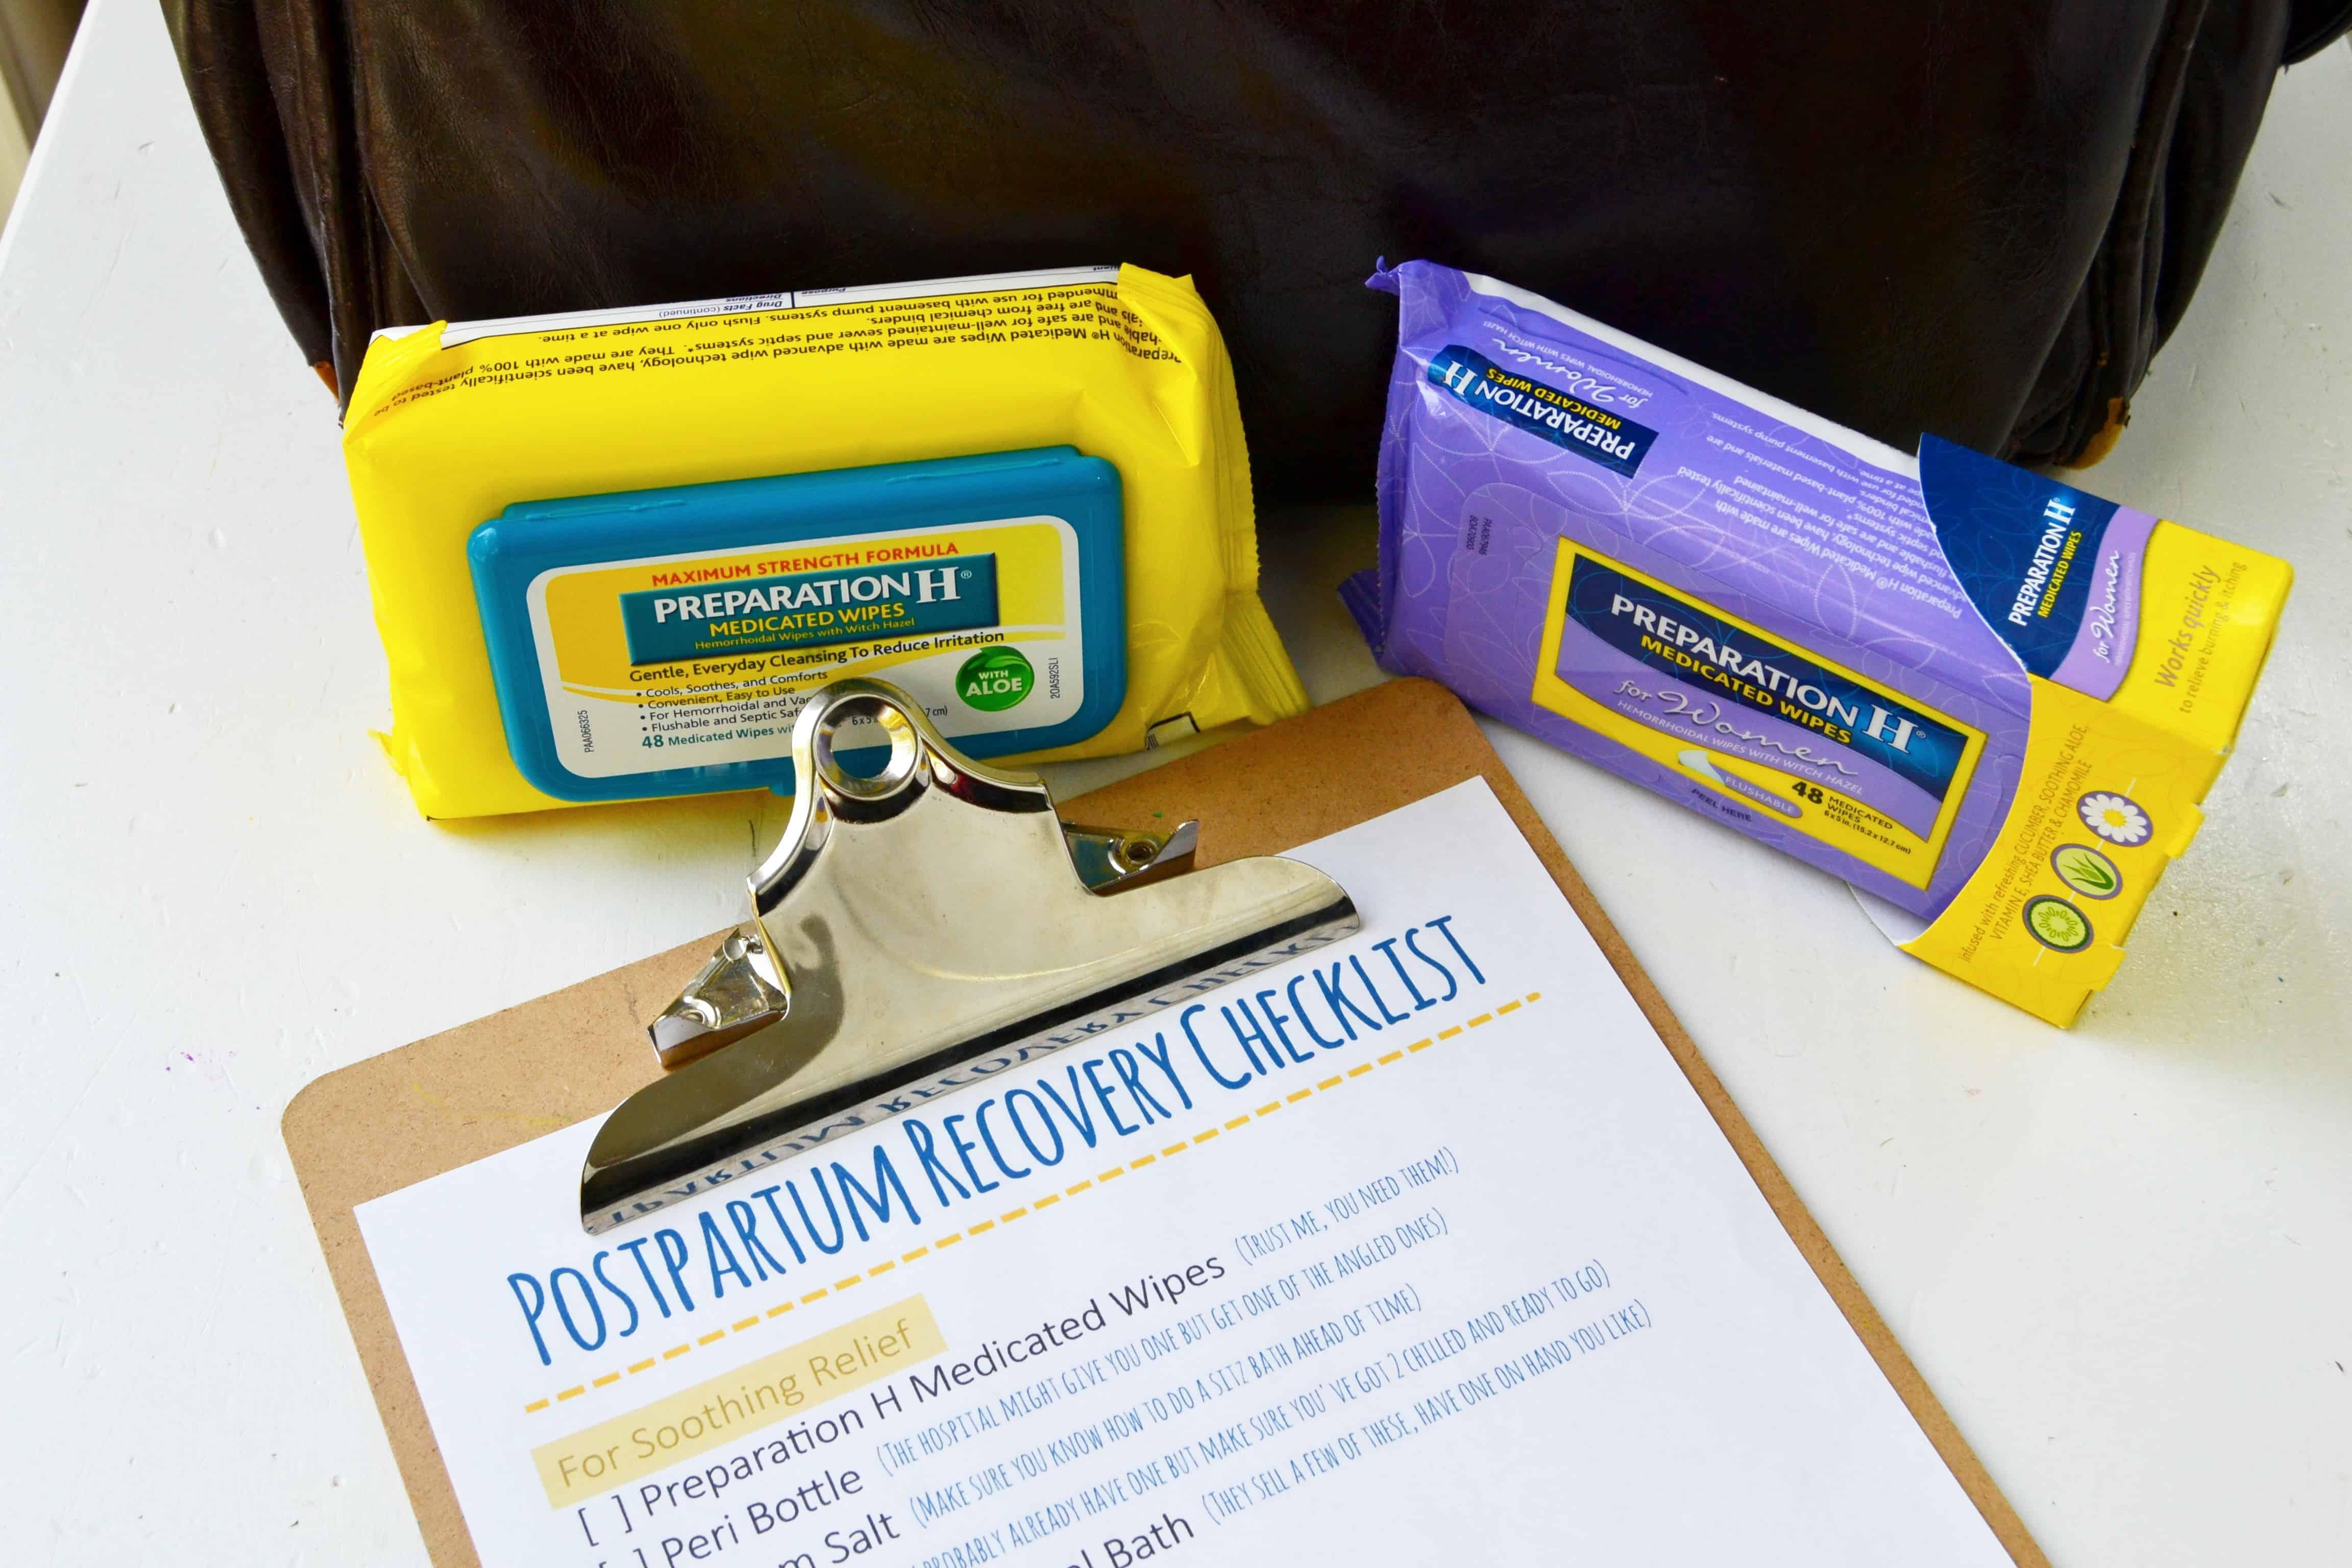 postpartum-recovery-checklist-4-dos